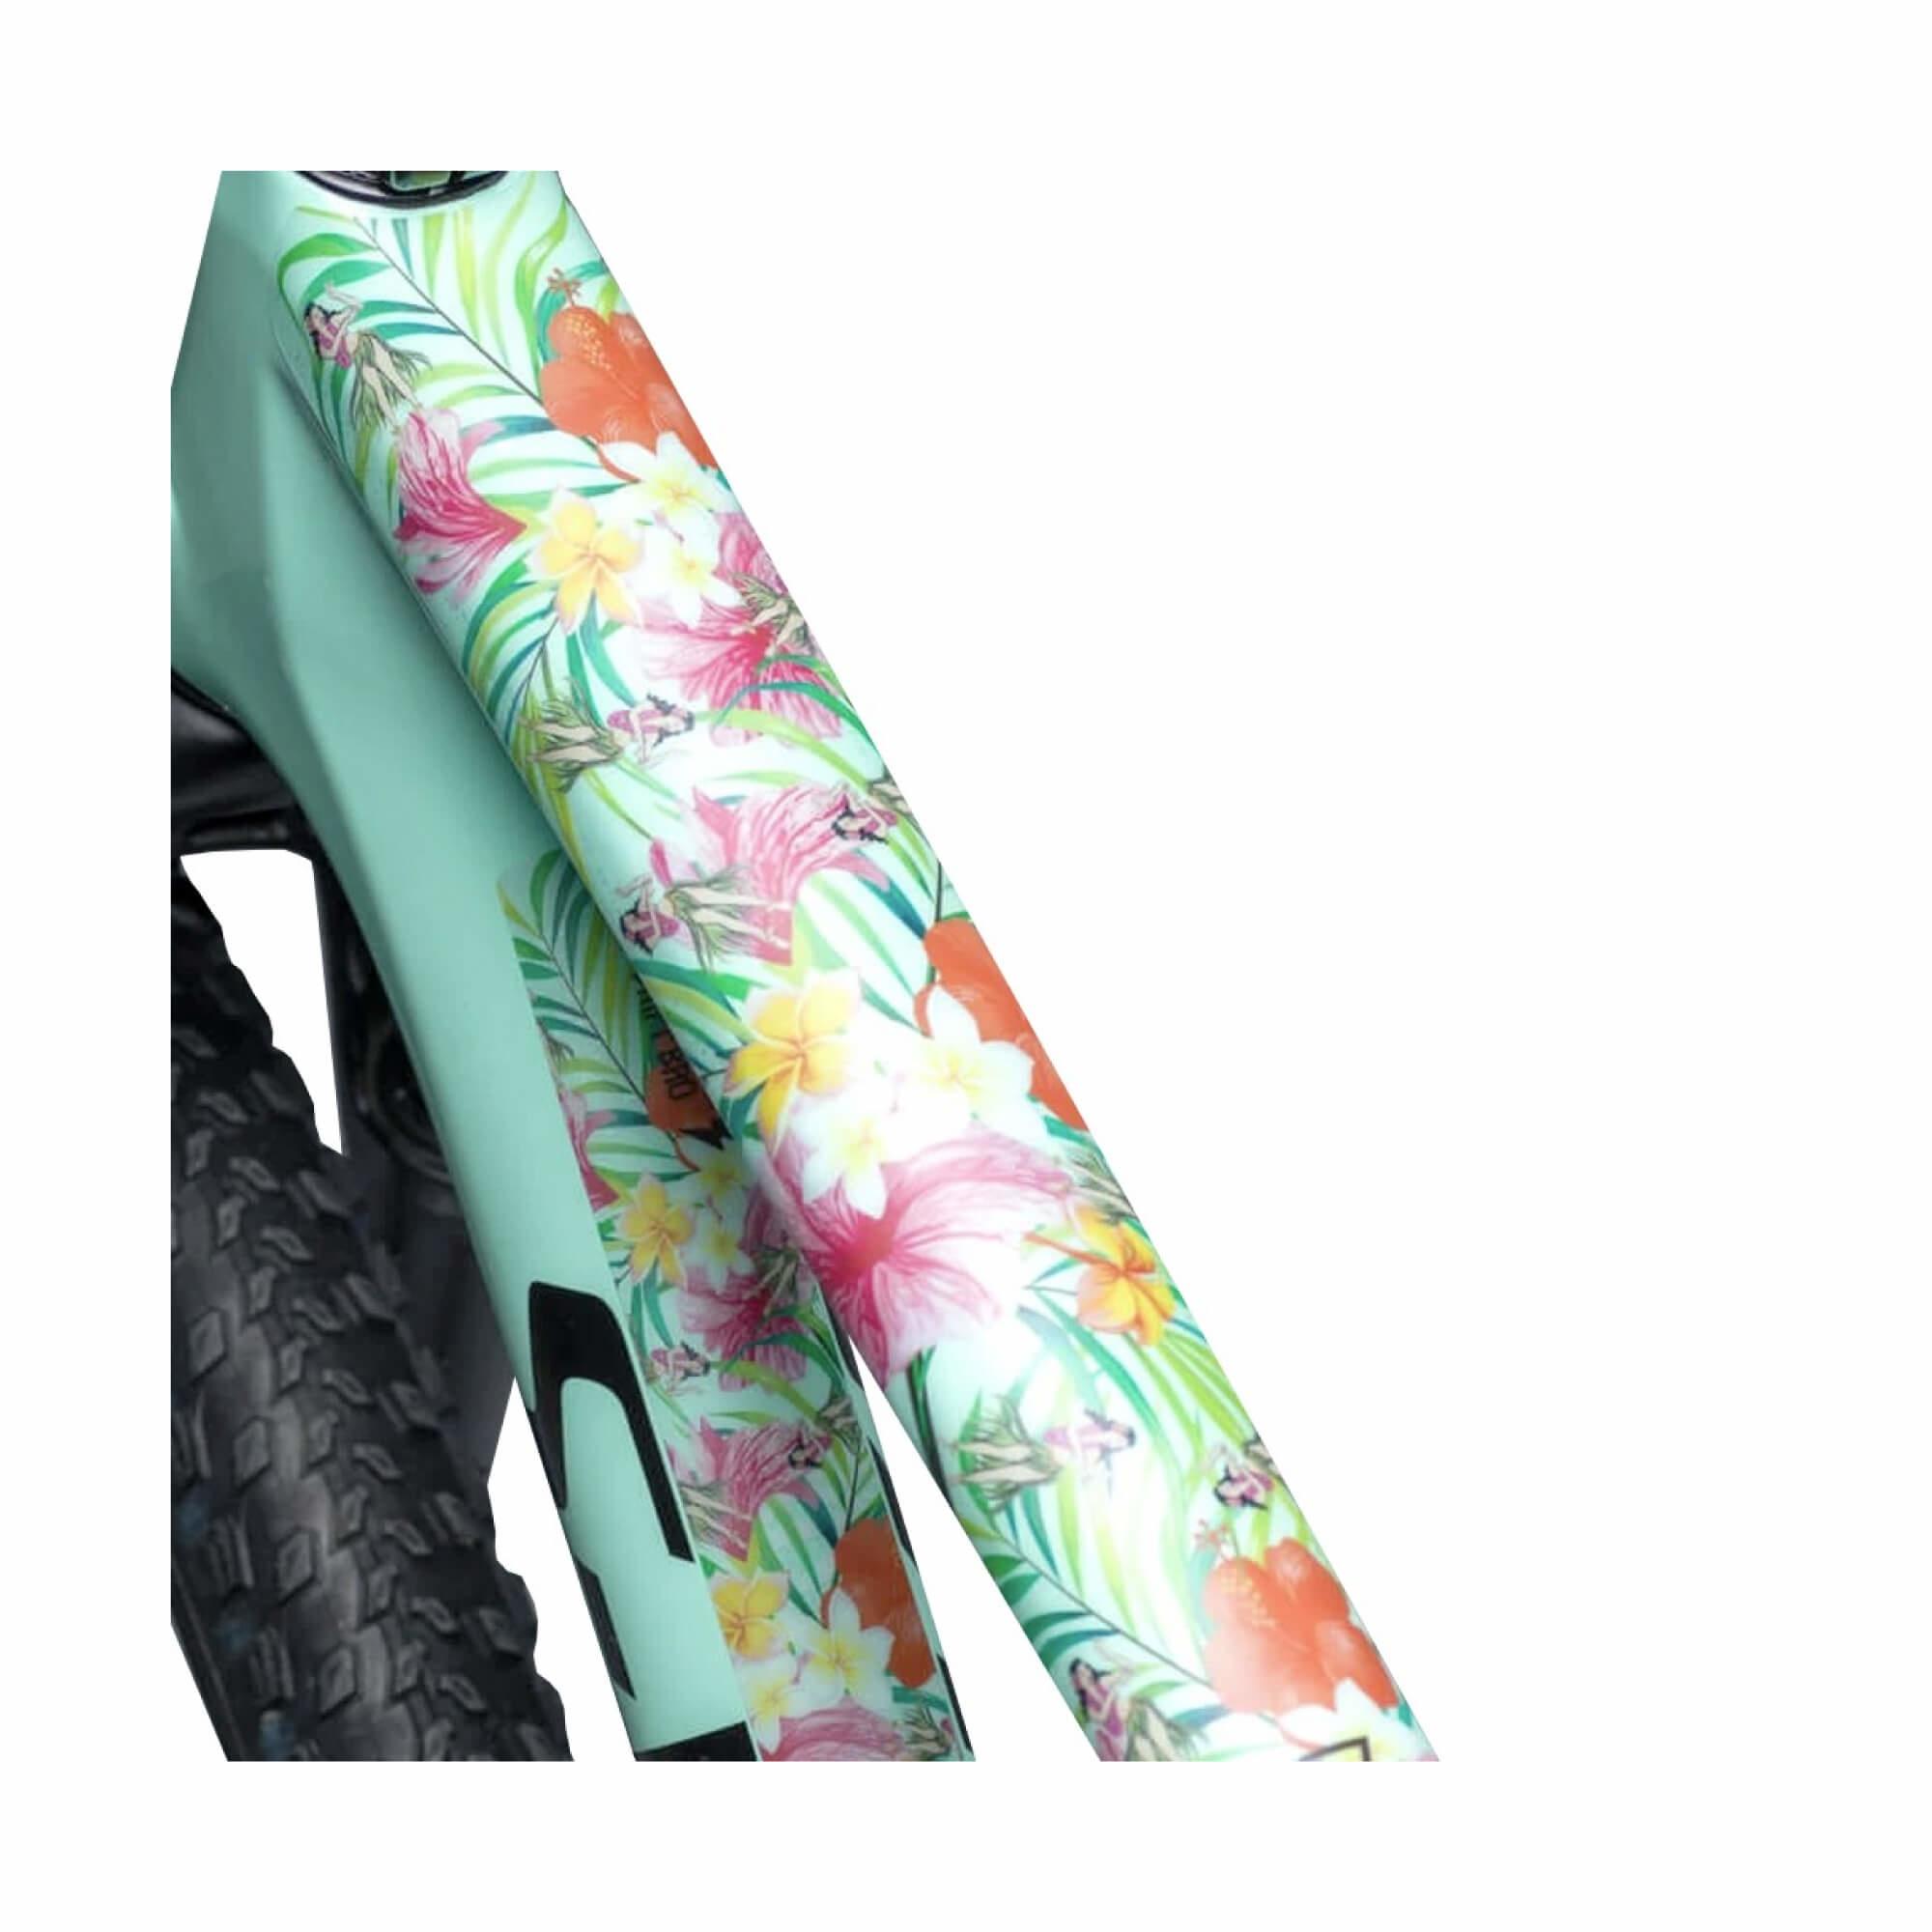 Frame Protection Wrap-6